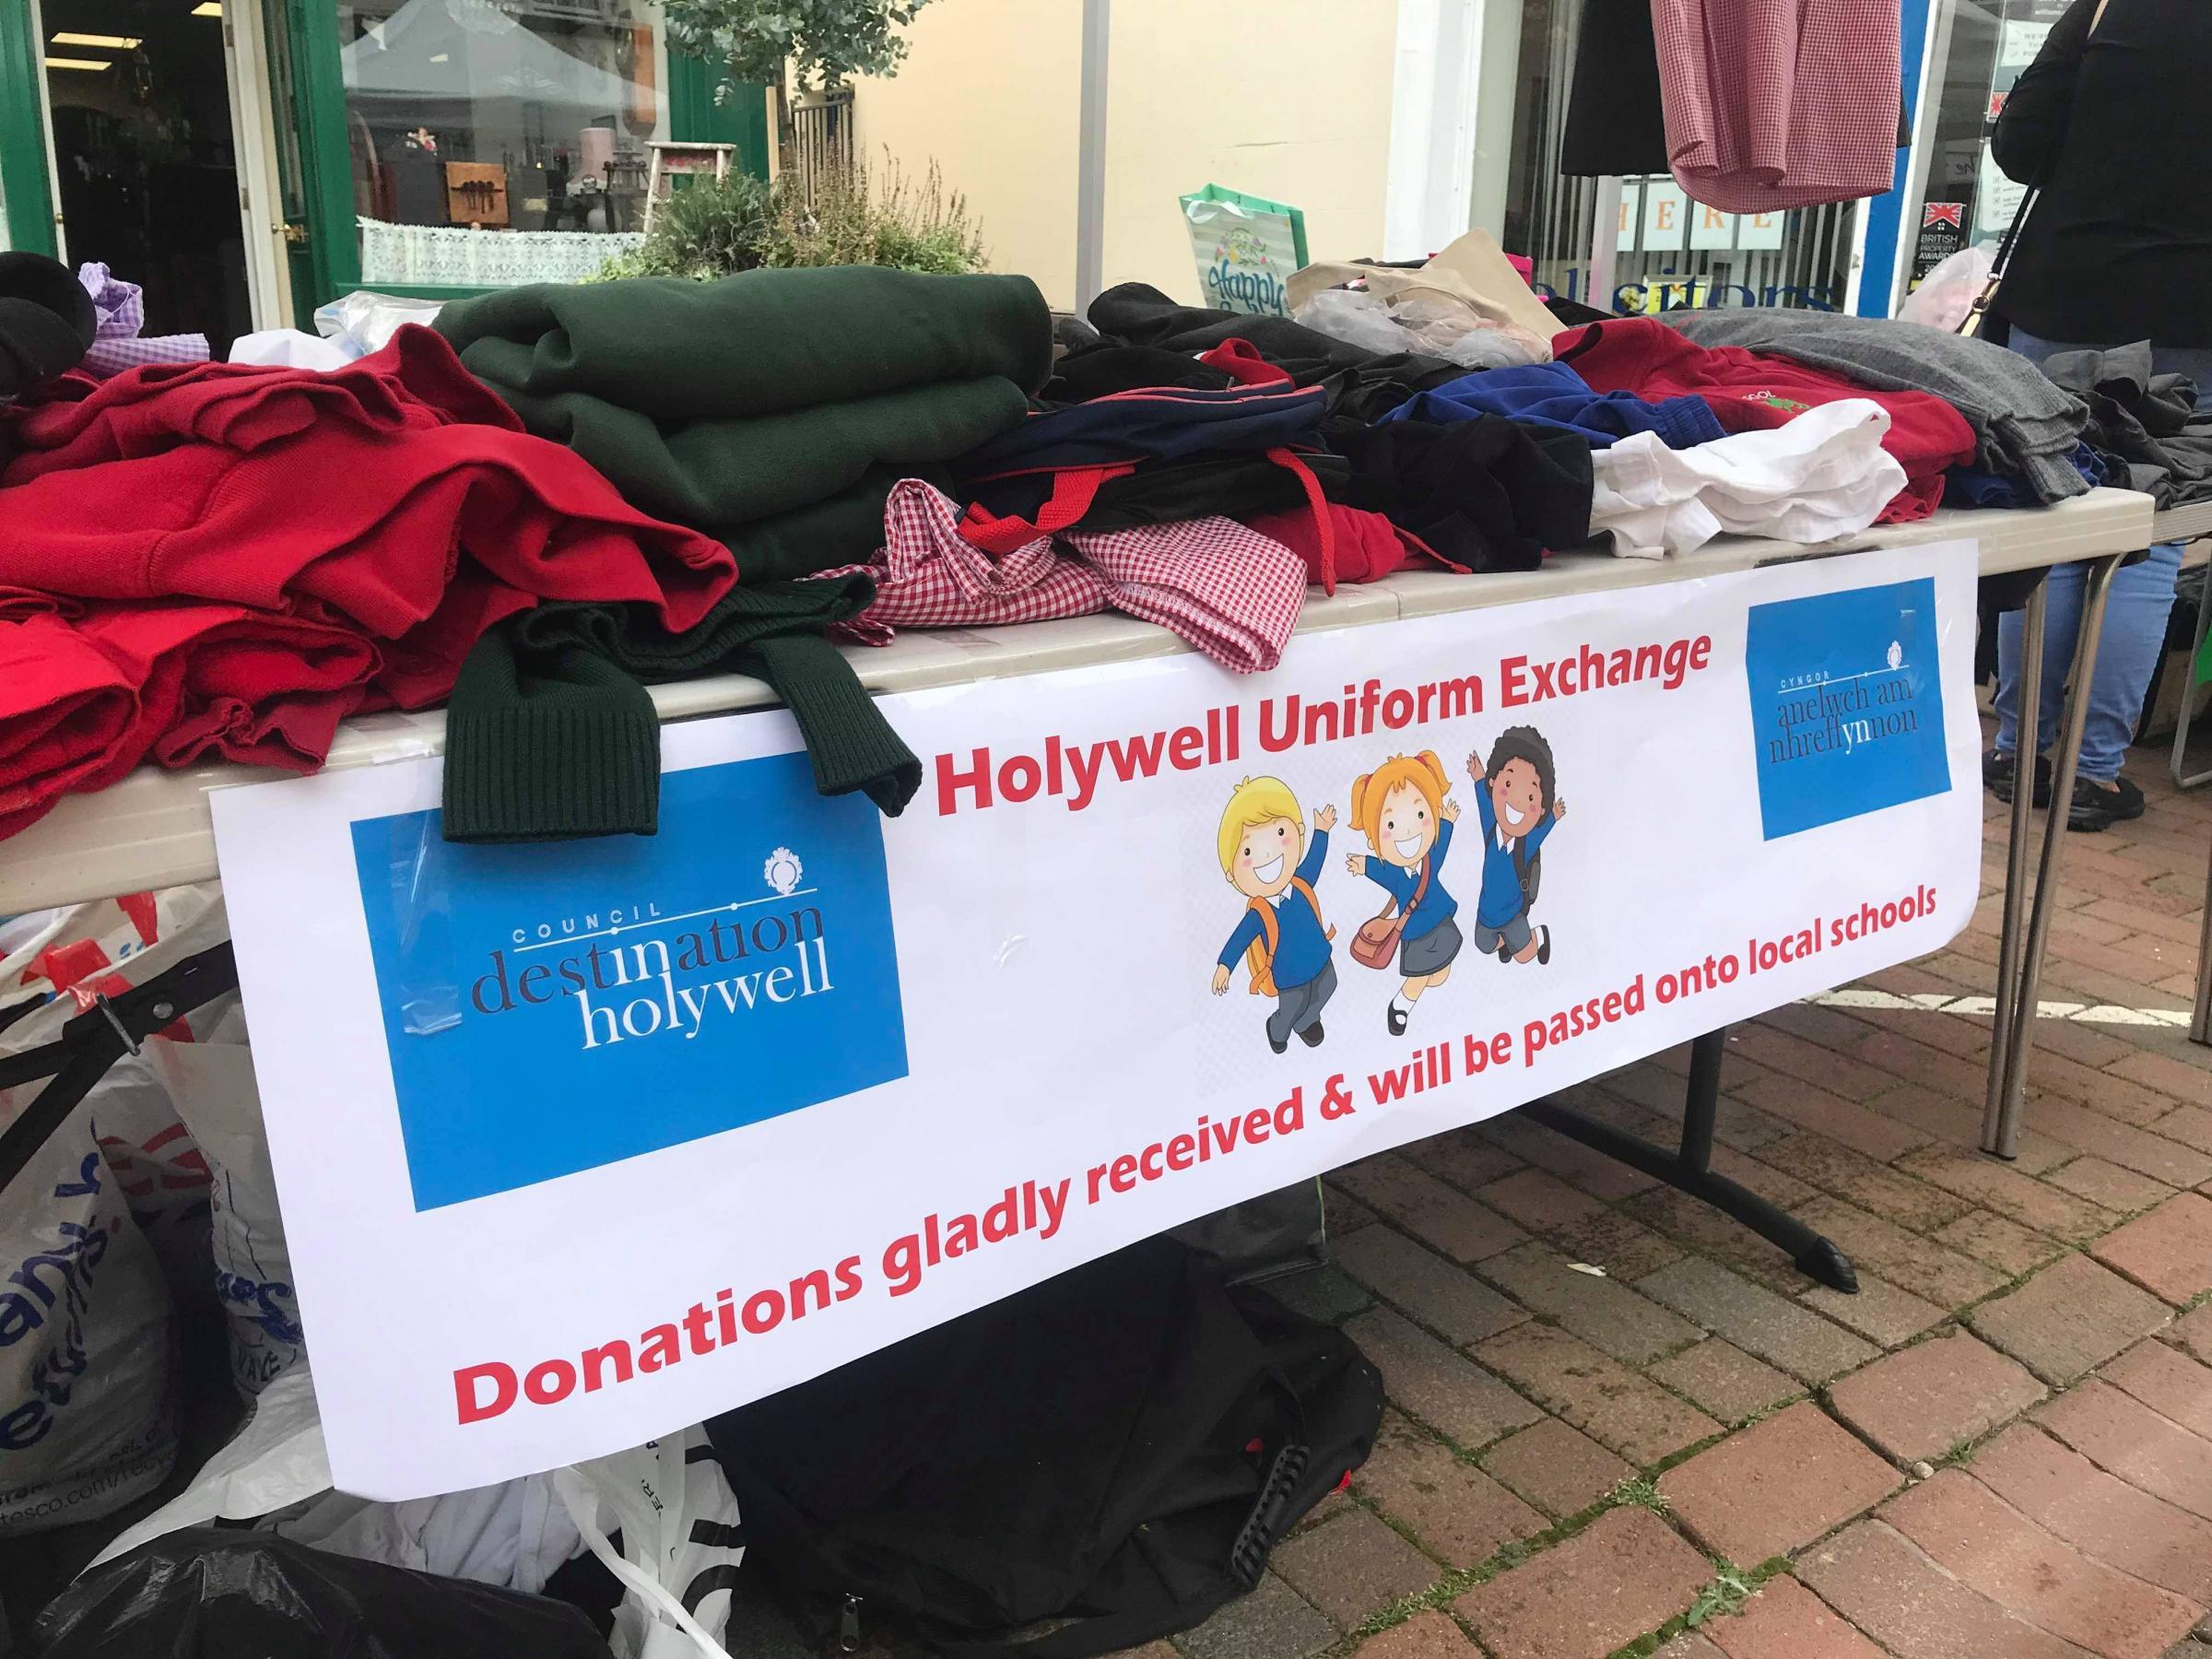 School uniform market stall to return over half term holiday's